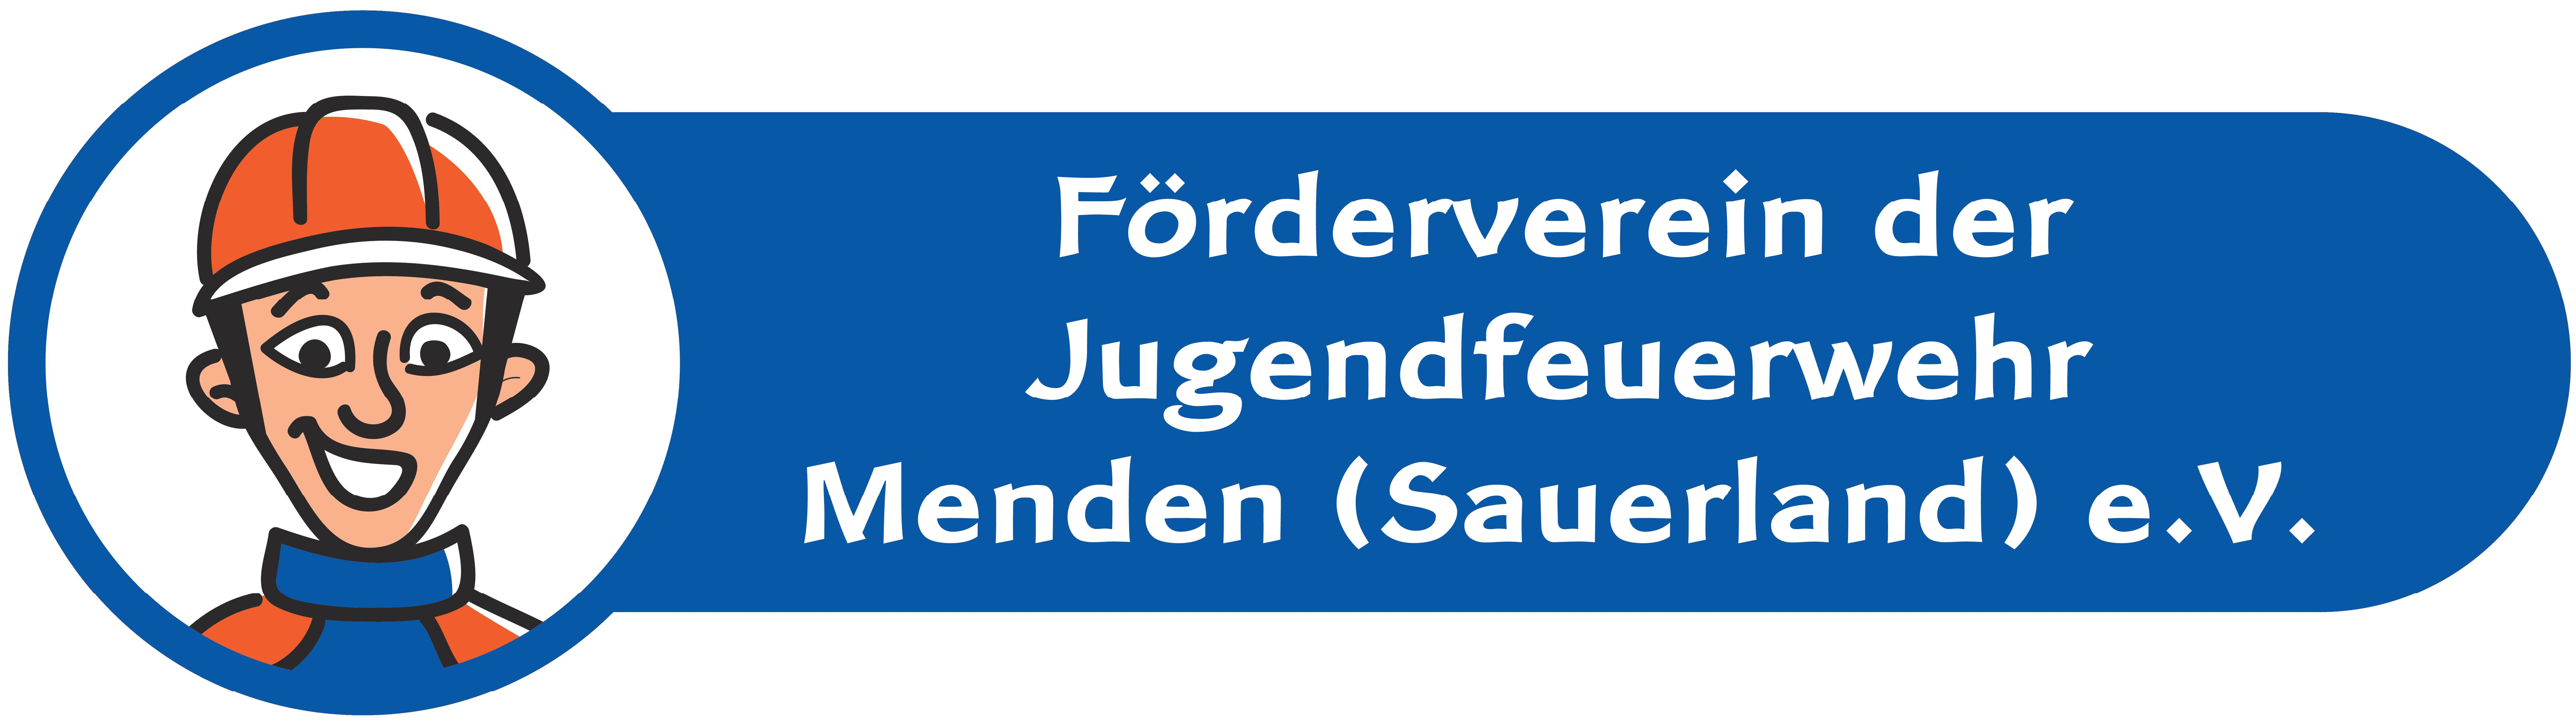 Logo Förderverein Jugendfeuerwehr Menden